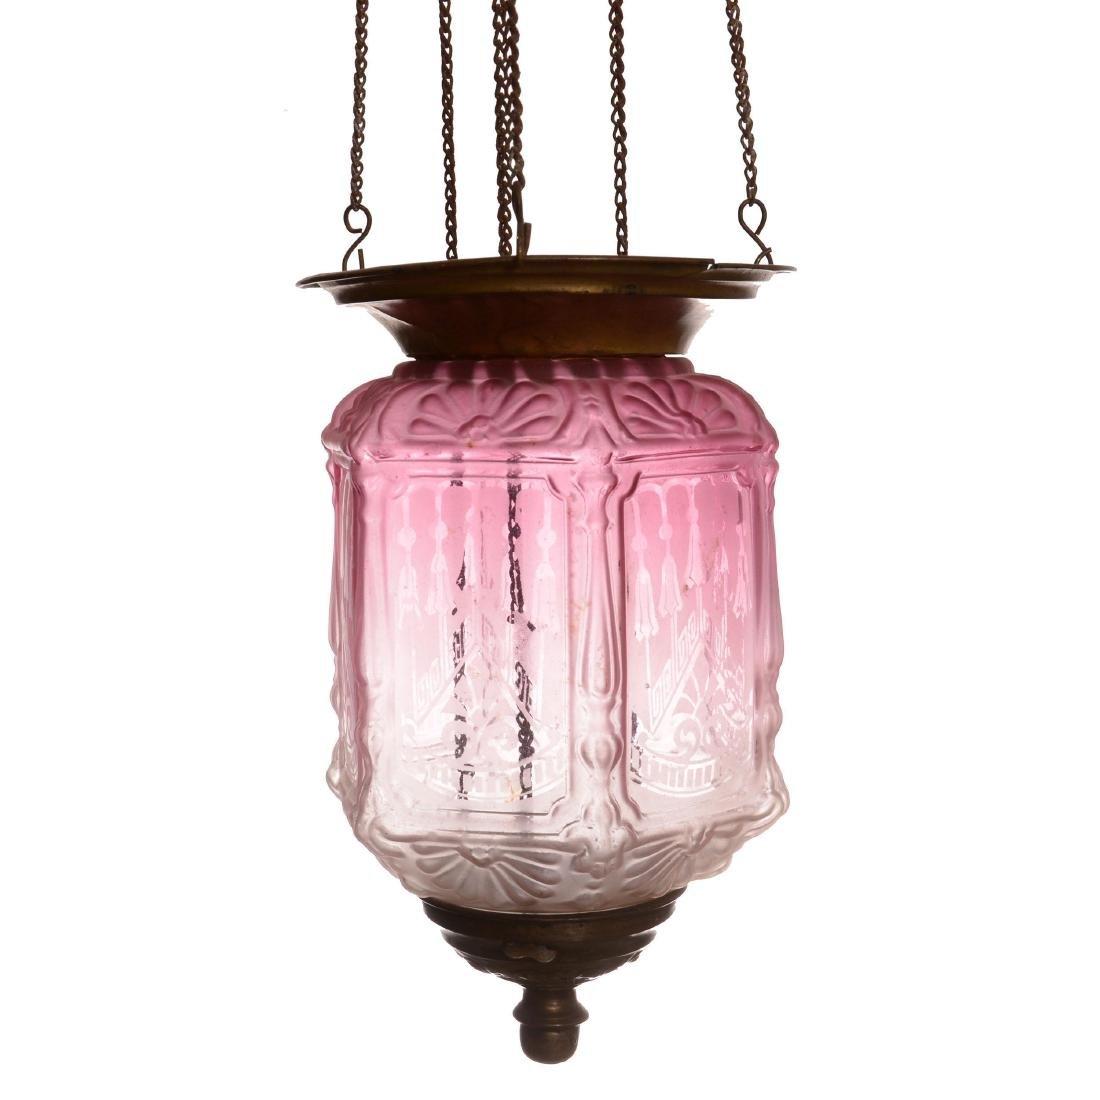 Hanging Hall Light Fixture